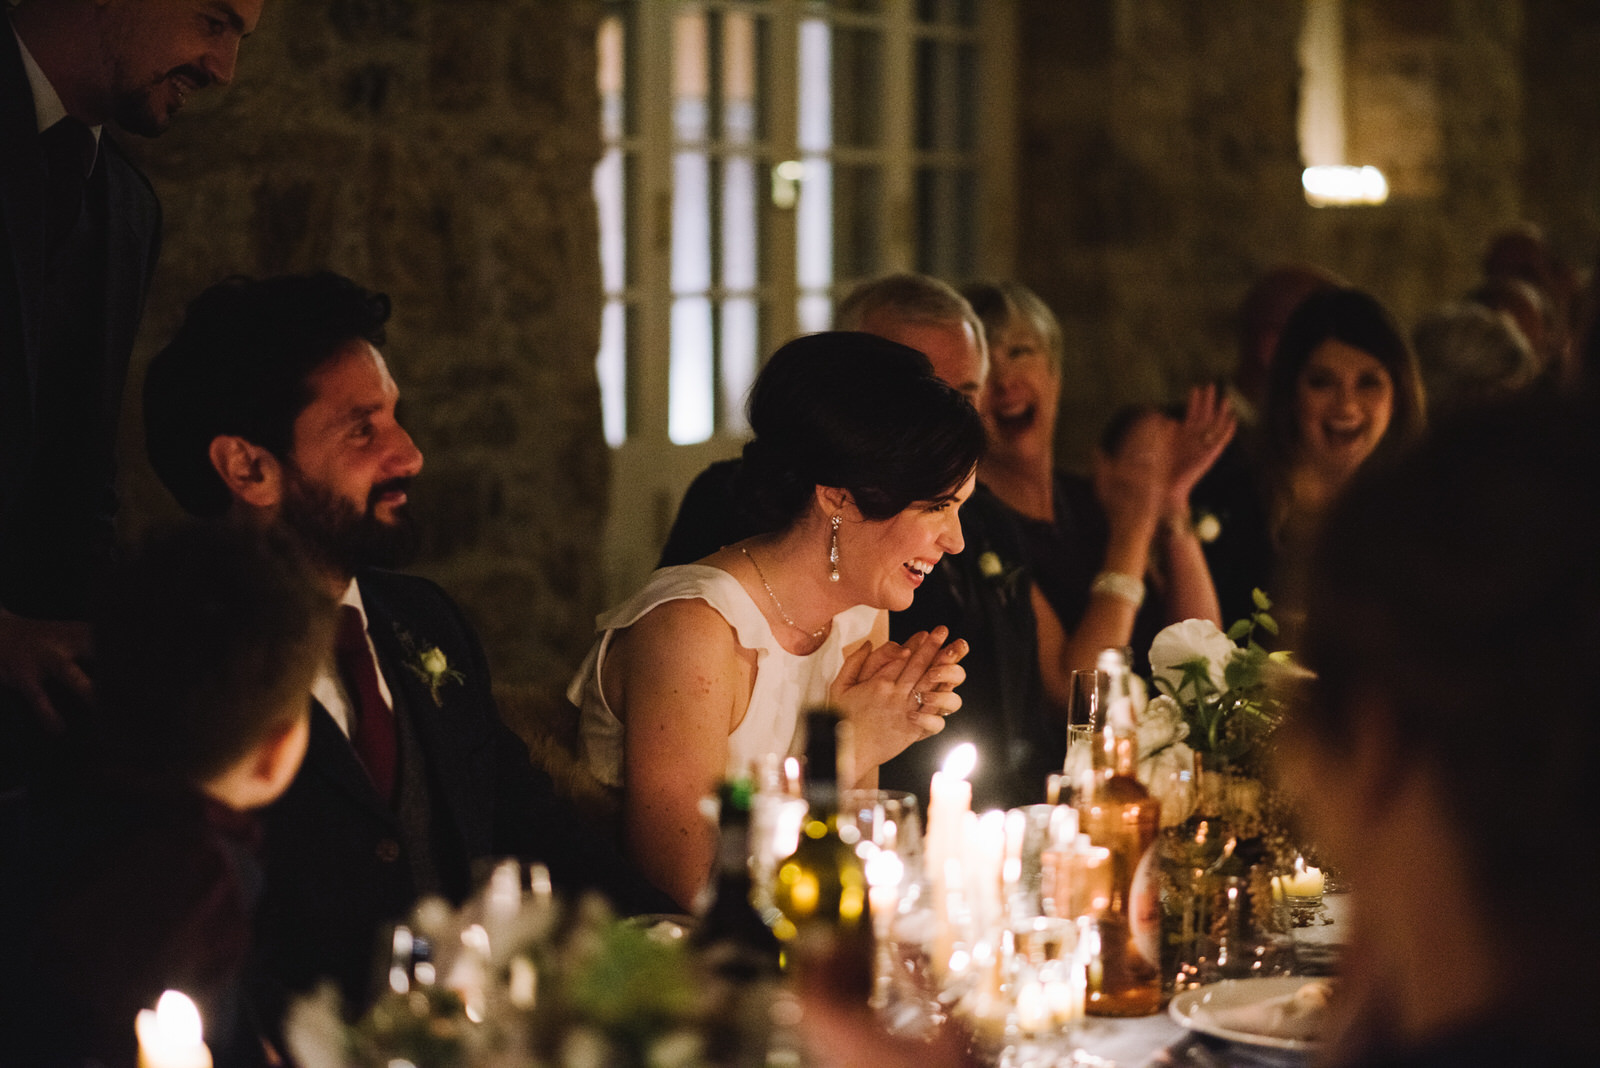 038-COLSTOUN-HOUSE-WEDDING-ALTERNATIVE-WEDDING-PHOTOGRAPHER-GLASGOW-WEDDING-PHOTOGRAPHER-STYLISH-SCOTTISH-WEDDING.JPG